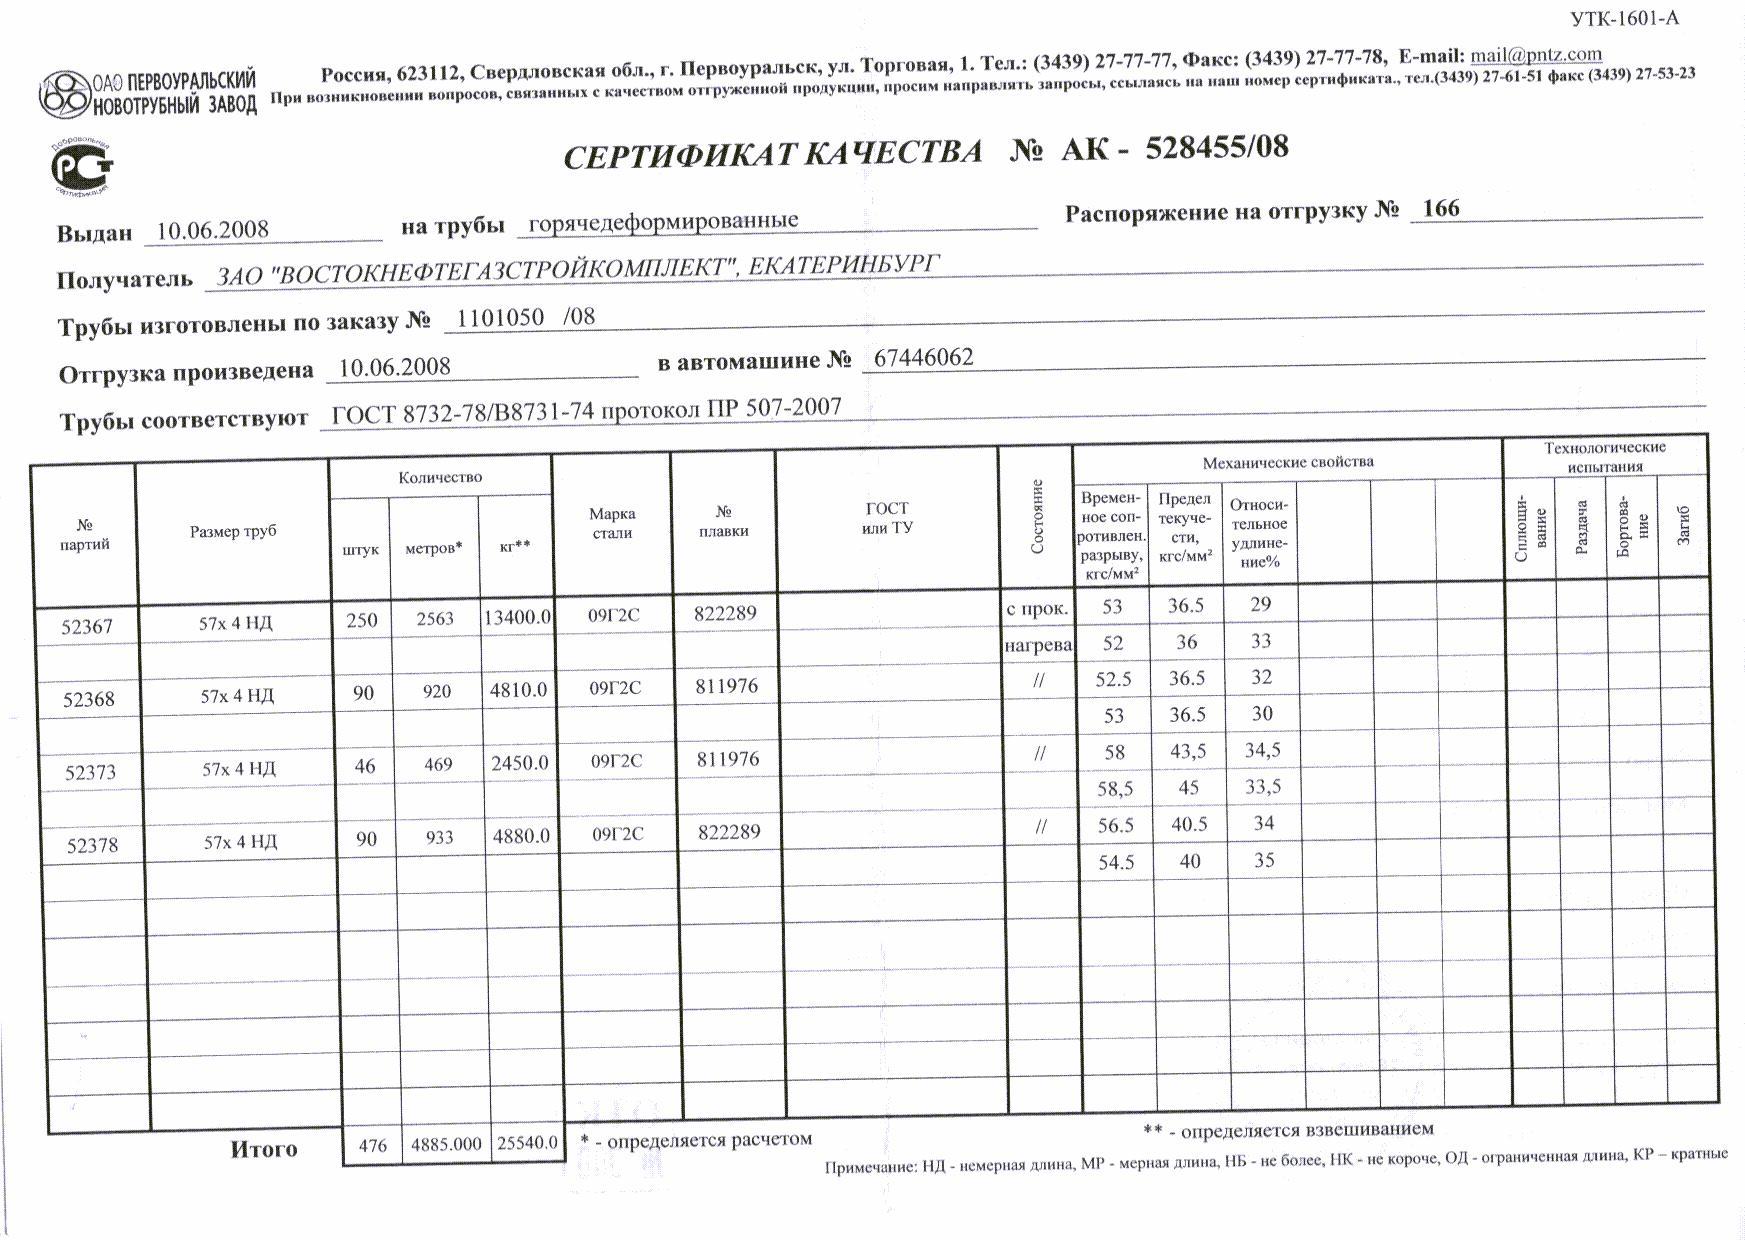 Сертификат на трубу электросварную 57х4 гост 8732-78 требования исо 9001-2001 казахстан